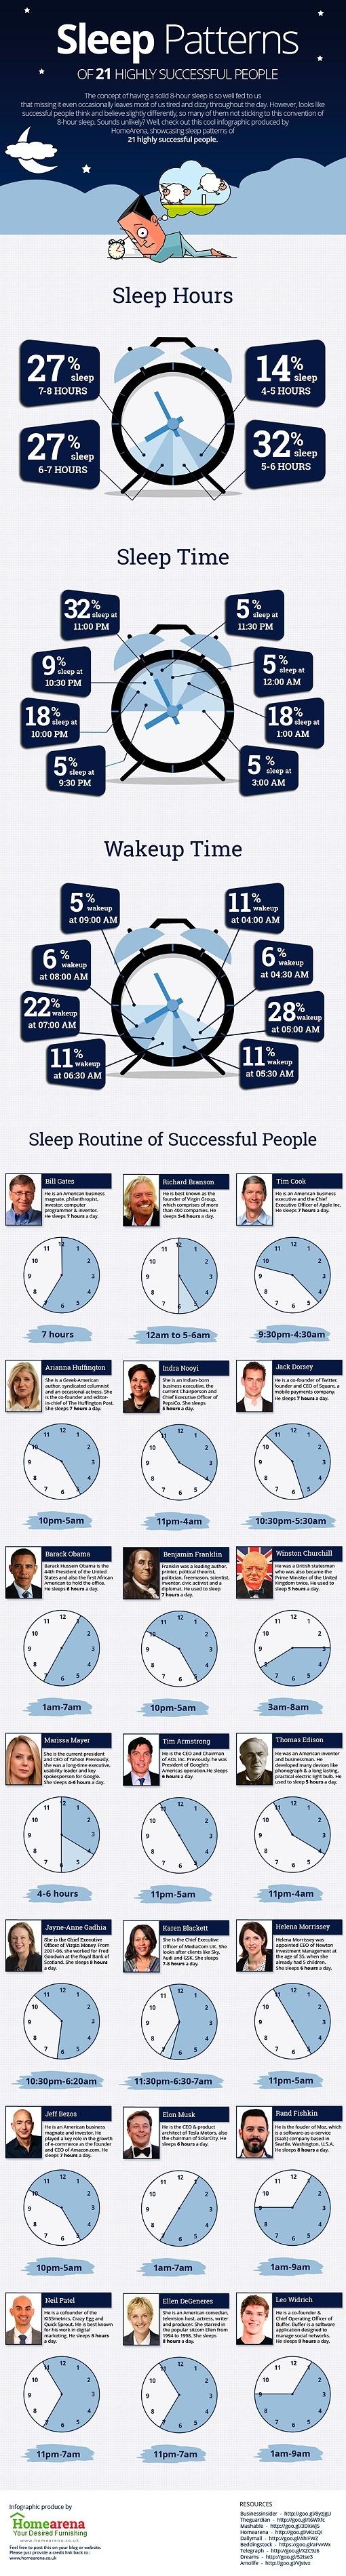 Sleep patterns of successful people